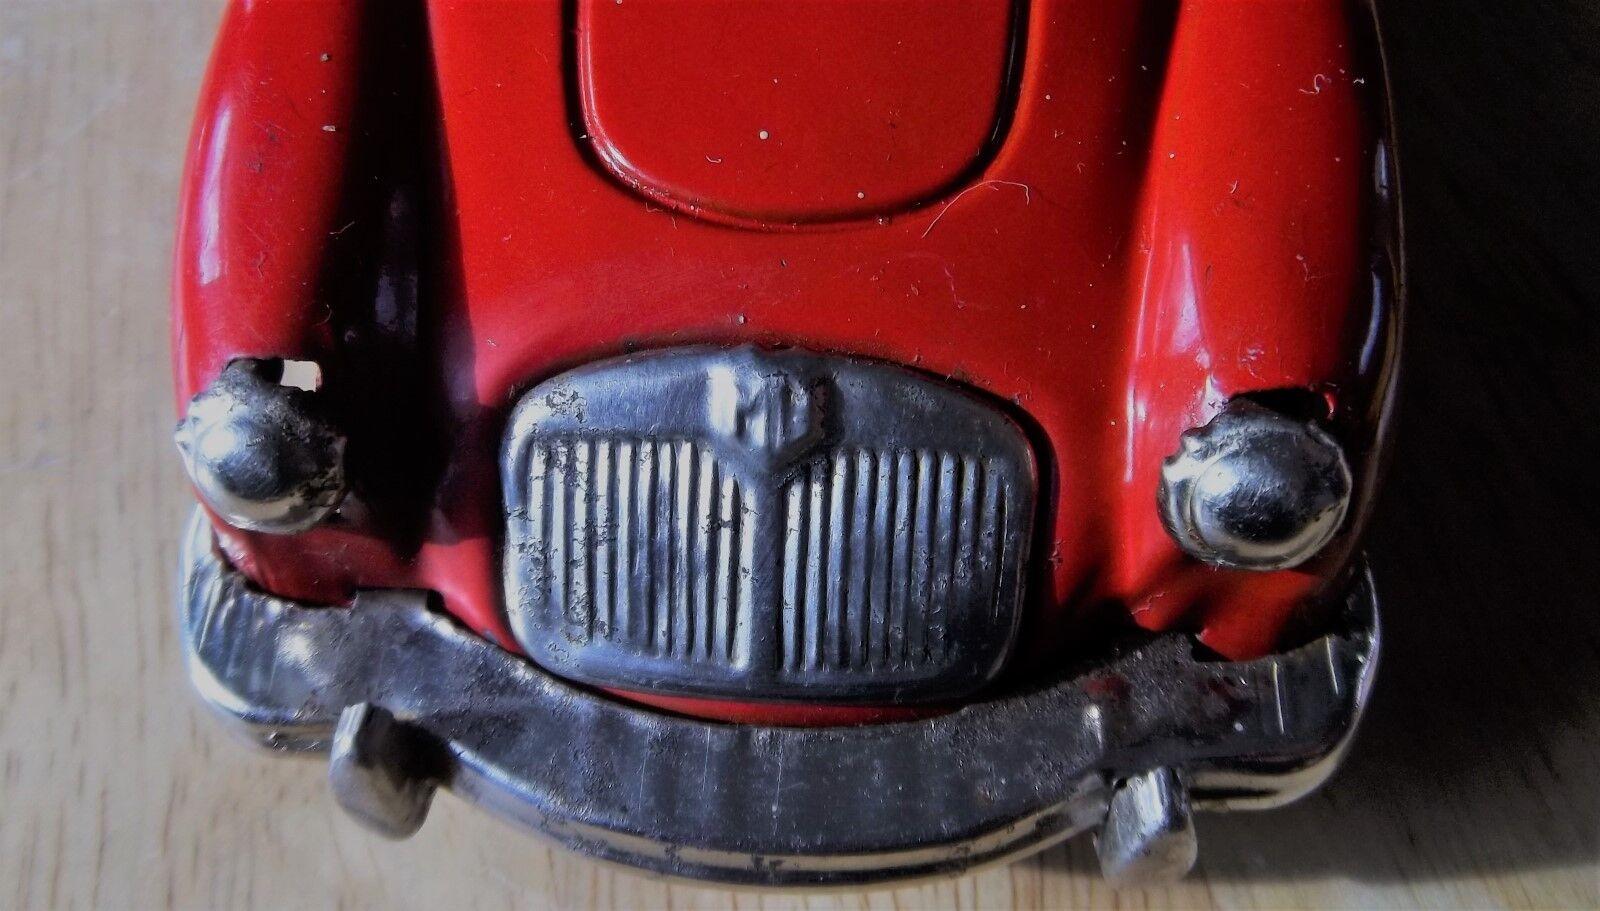 1 MG MG MG MGA RED SANSHIN TINPLATE MOTORIZED KEY WIND-UP 7+1 2  LONG MGA MG TIN CAR 1f7985